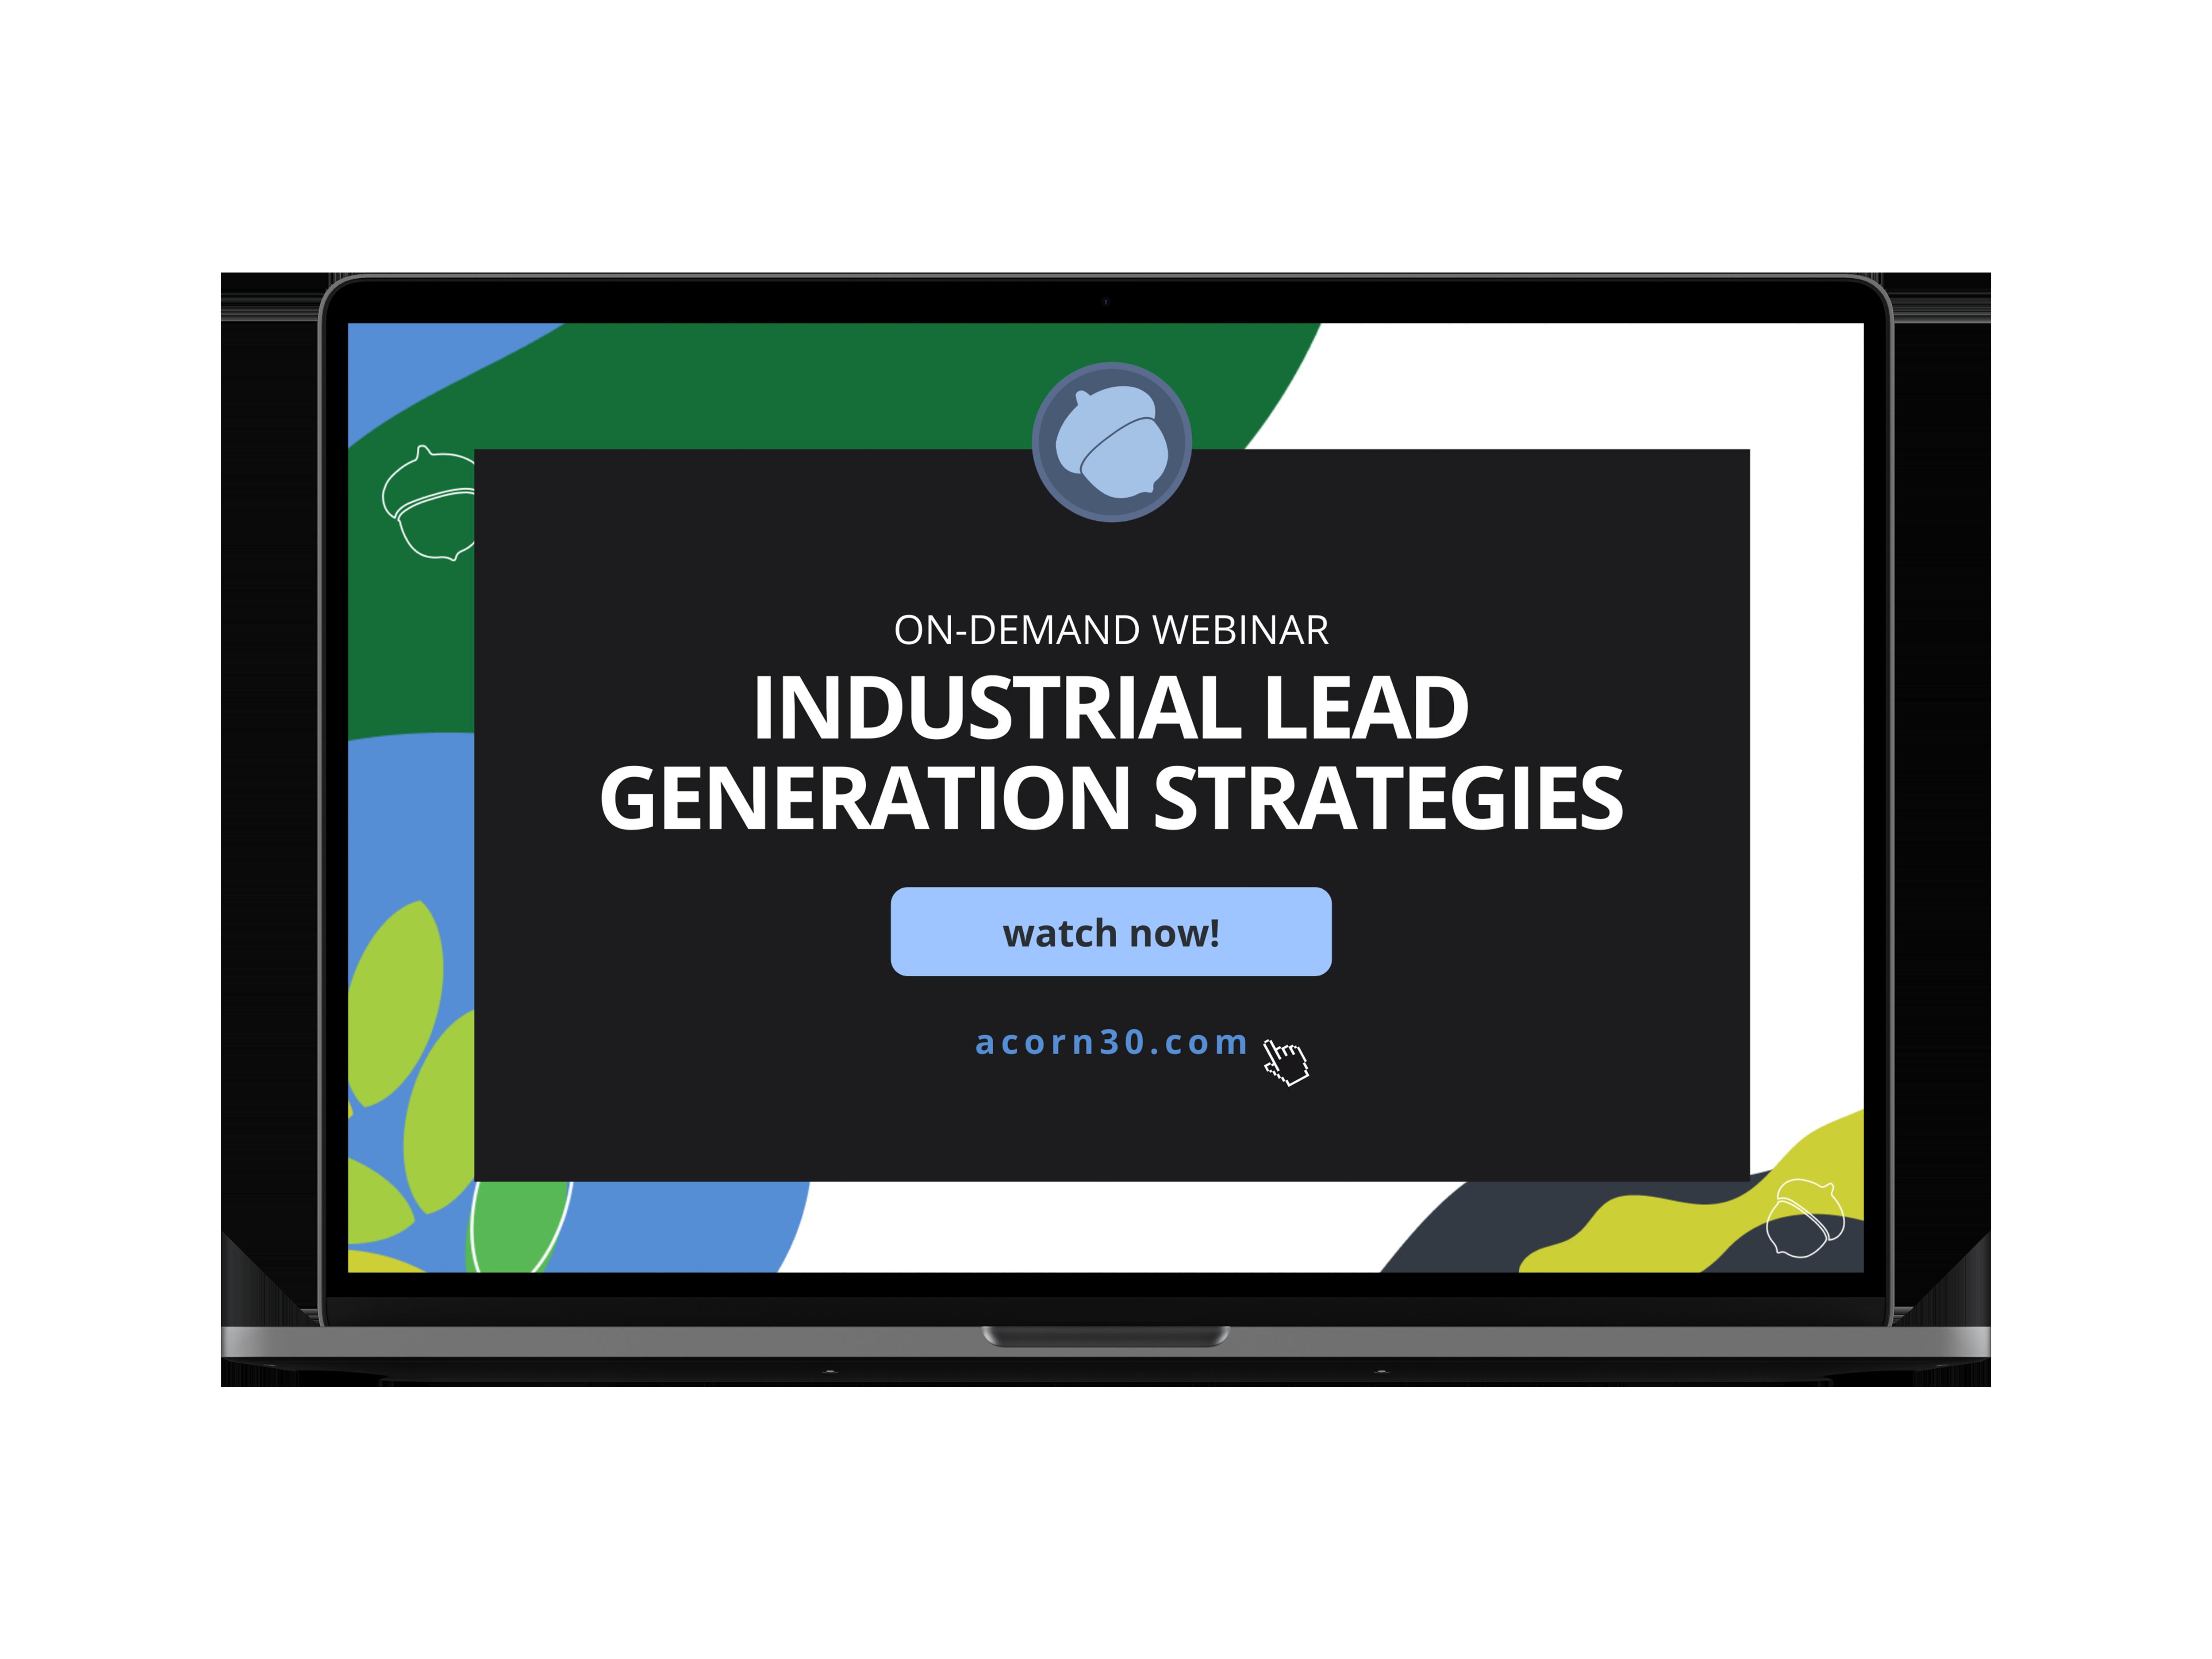 On-Demand Webinar-Industrial Lead Generation